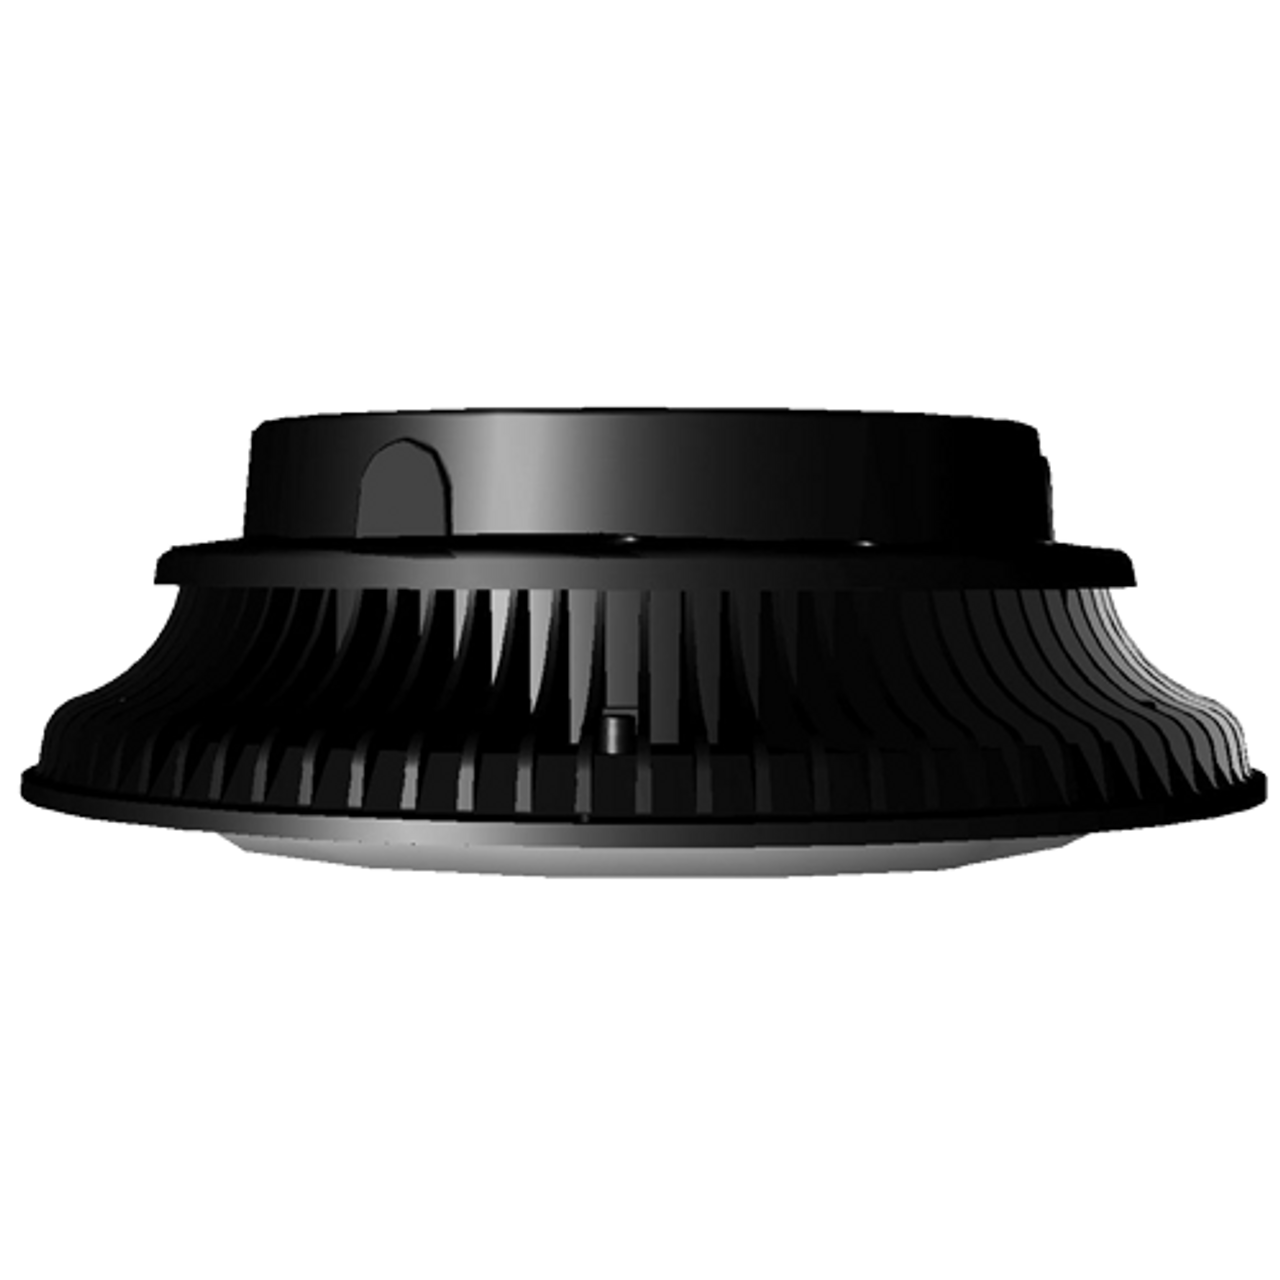 84 Watt LED Reveal Small Round Canopy Light